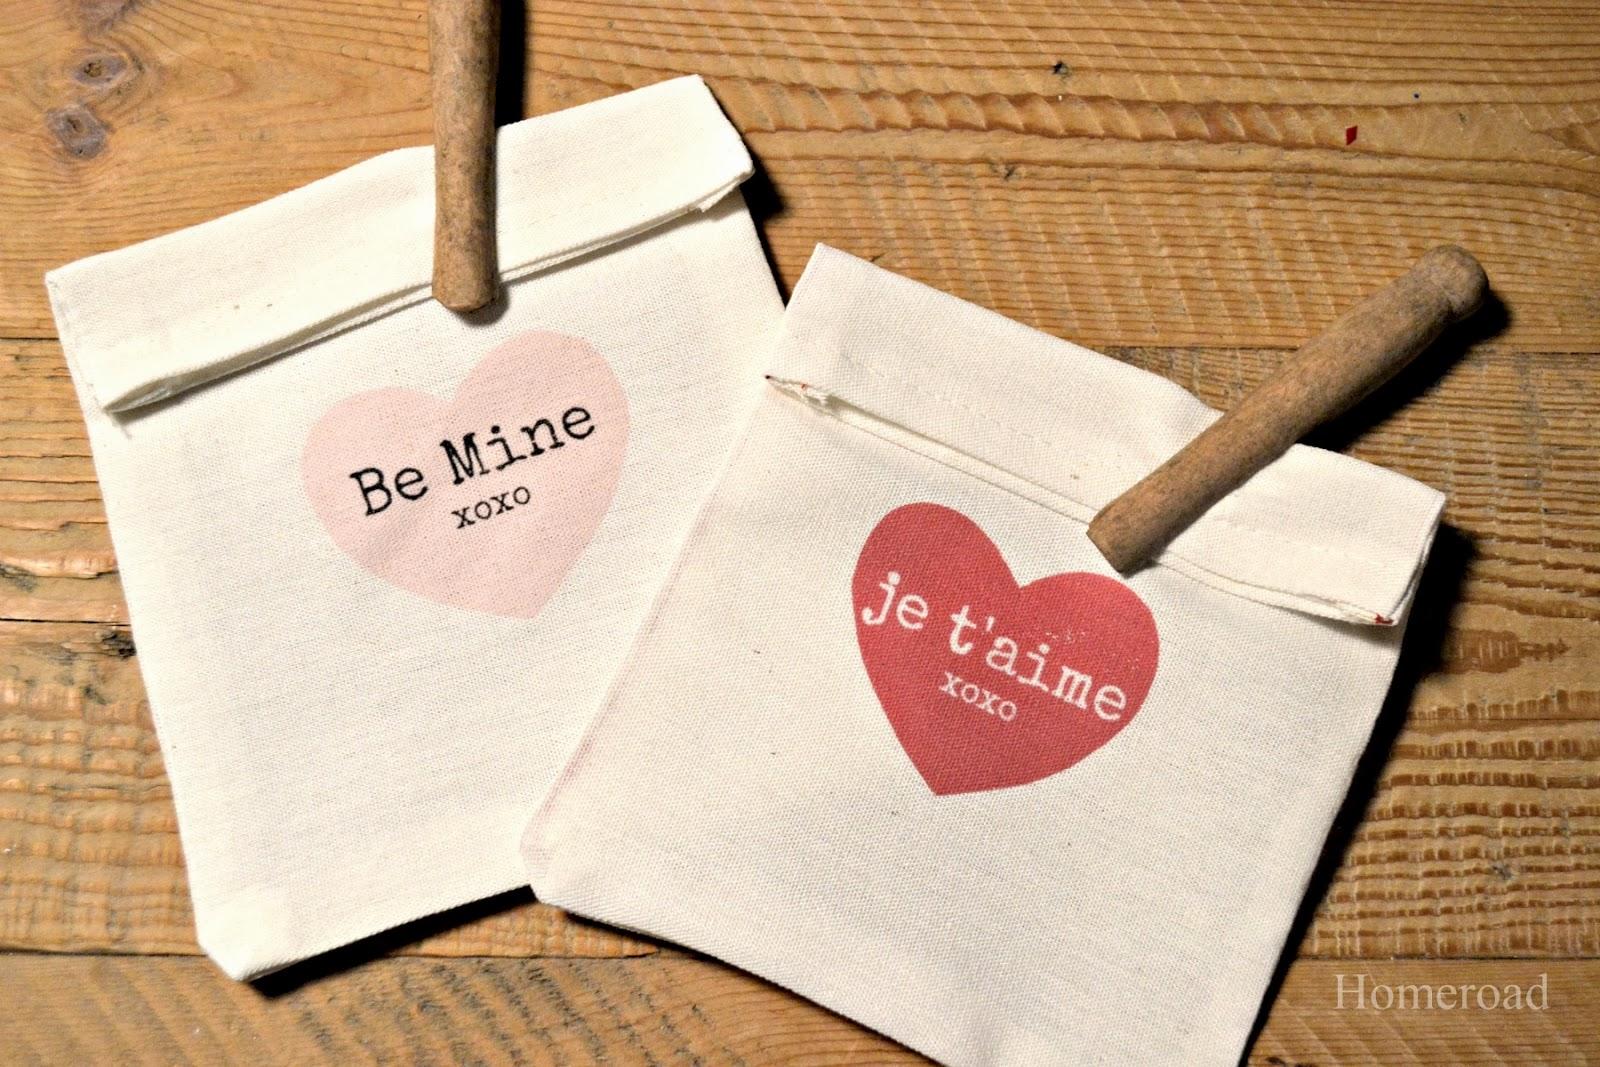 Heart Bags and Transfer Paper www.homeroad.net